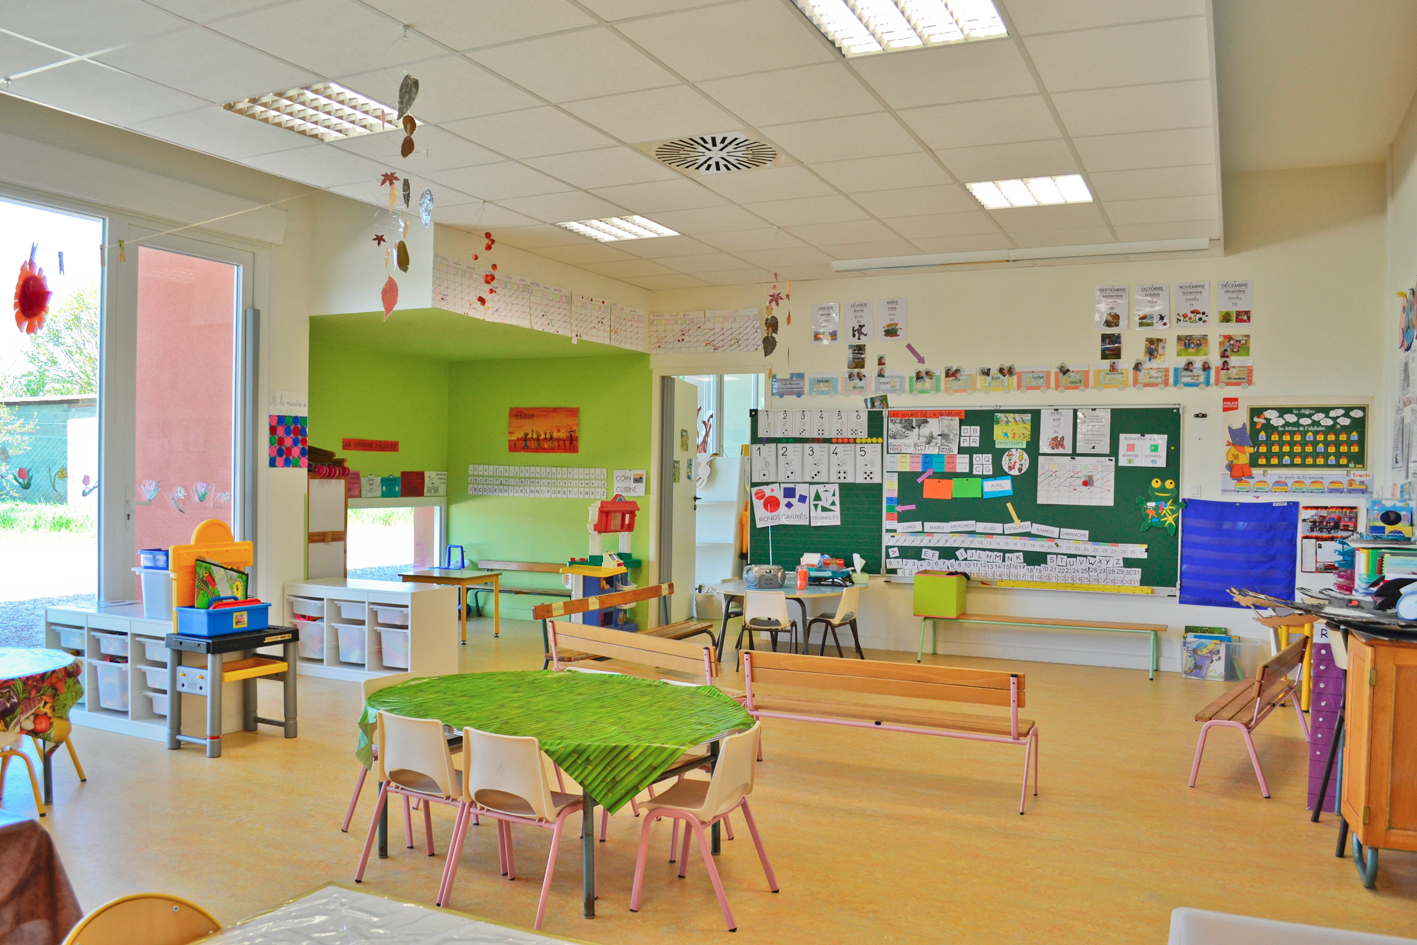 Ecole maternelle tria - Image classe maternelle ...